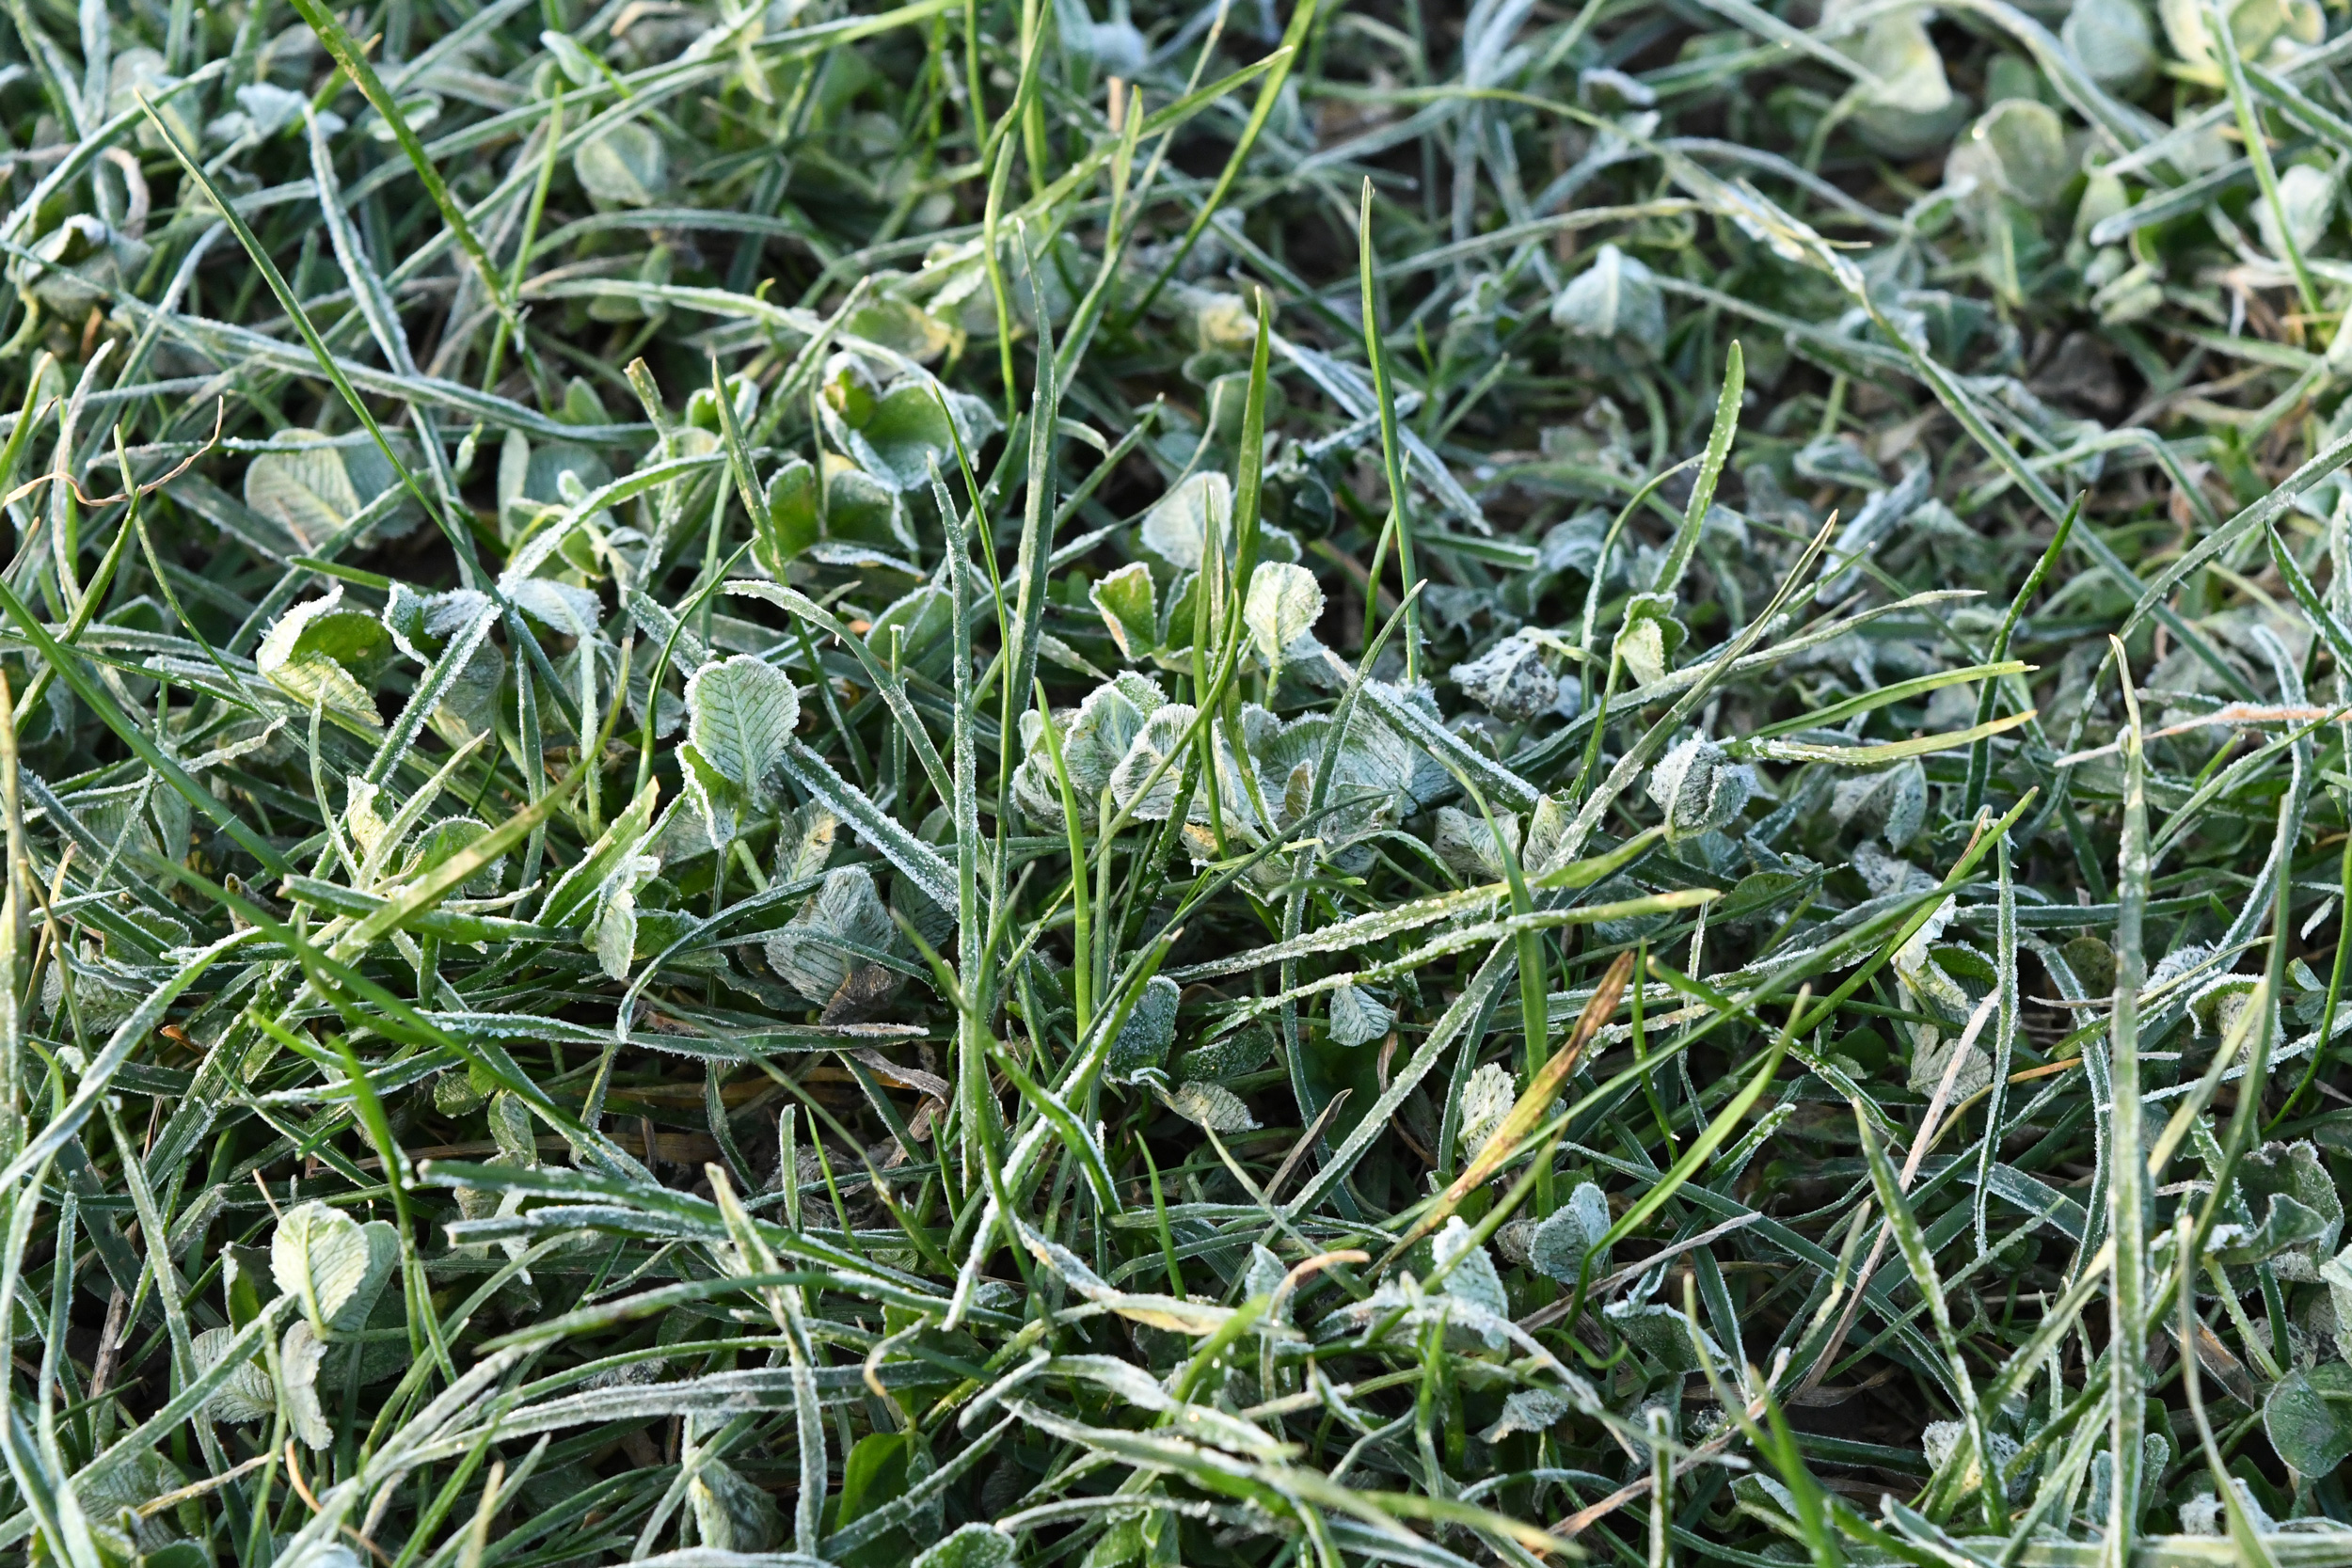 Clover under frost, Prospect Park